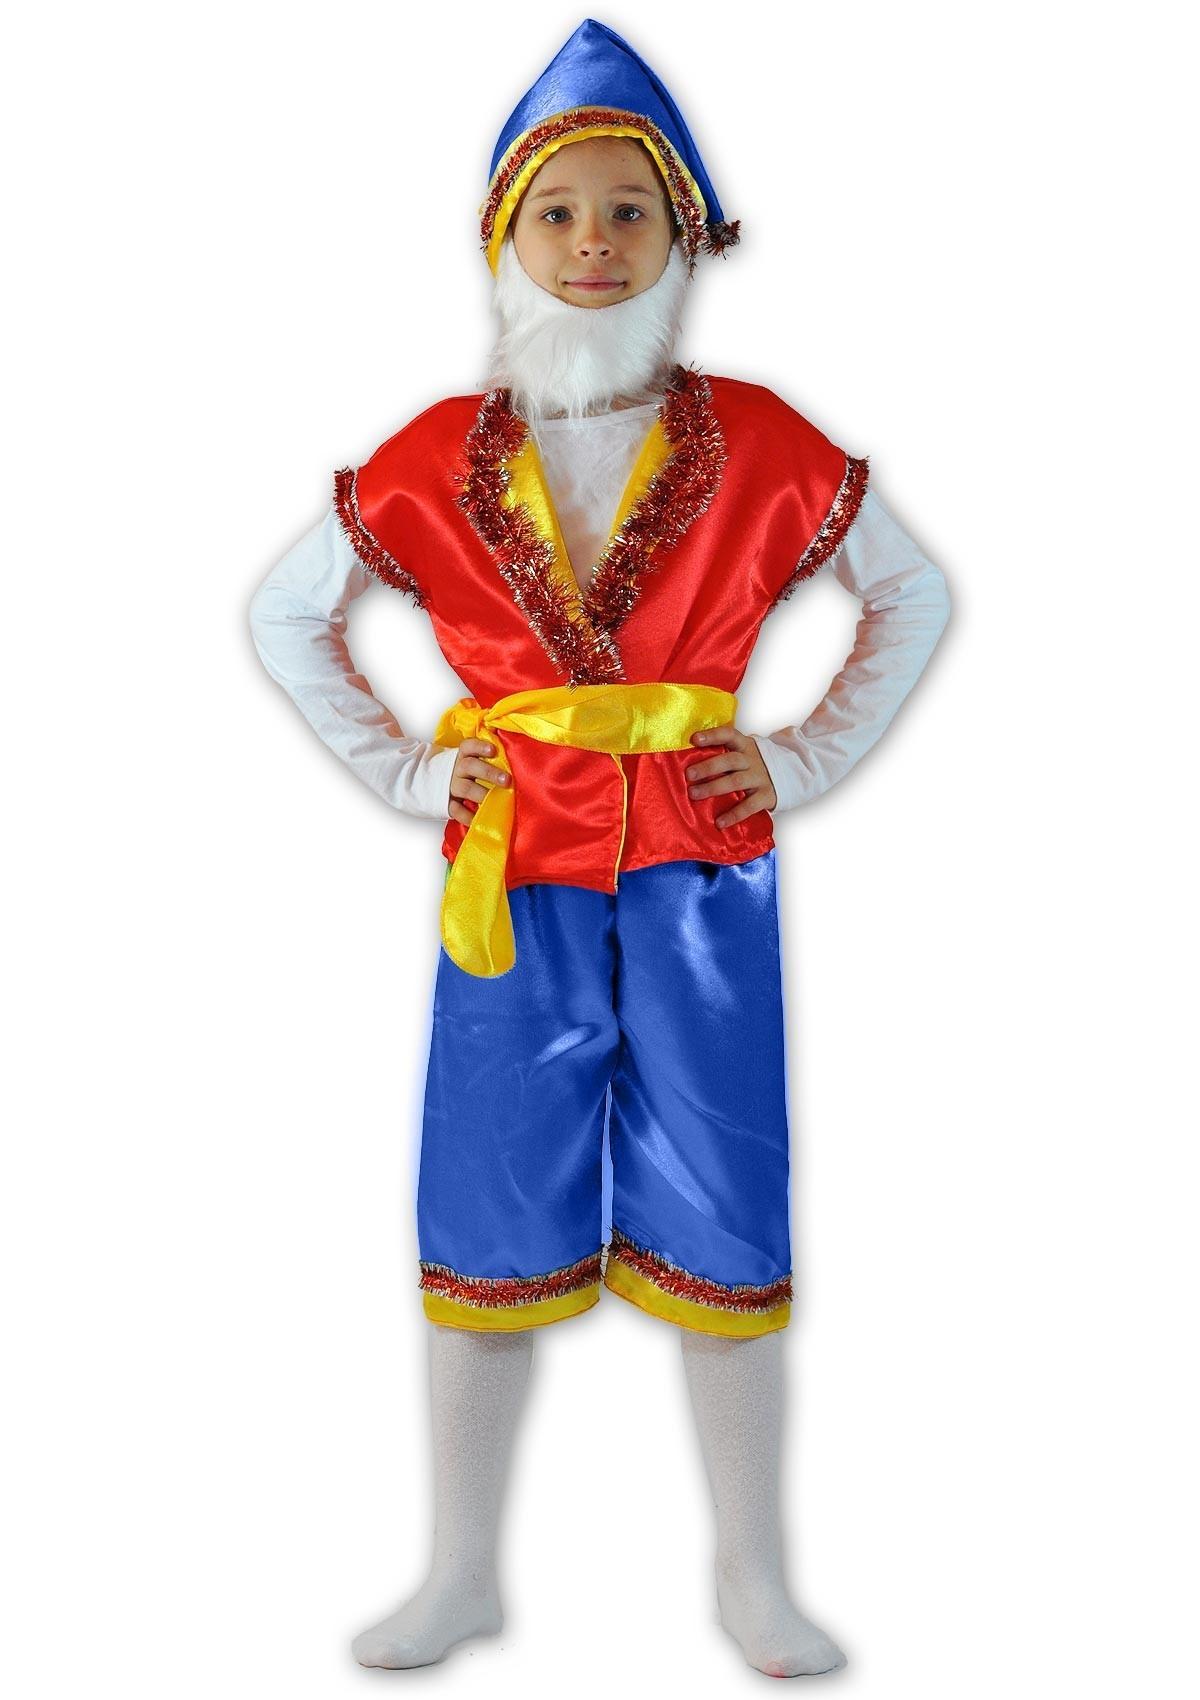 Красно-синий костюм гномика (26) nineminutes жаккардовая юбка найнминутес slit 1015 красно синий 1 красно синий